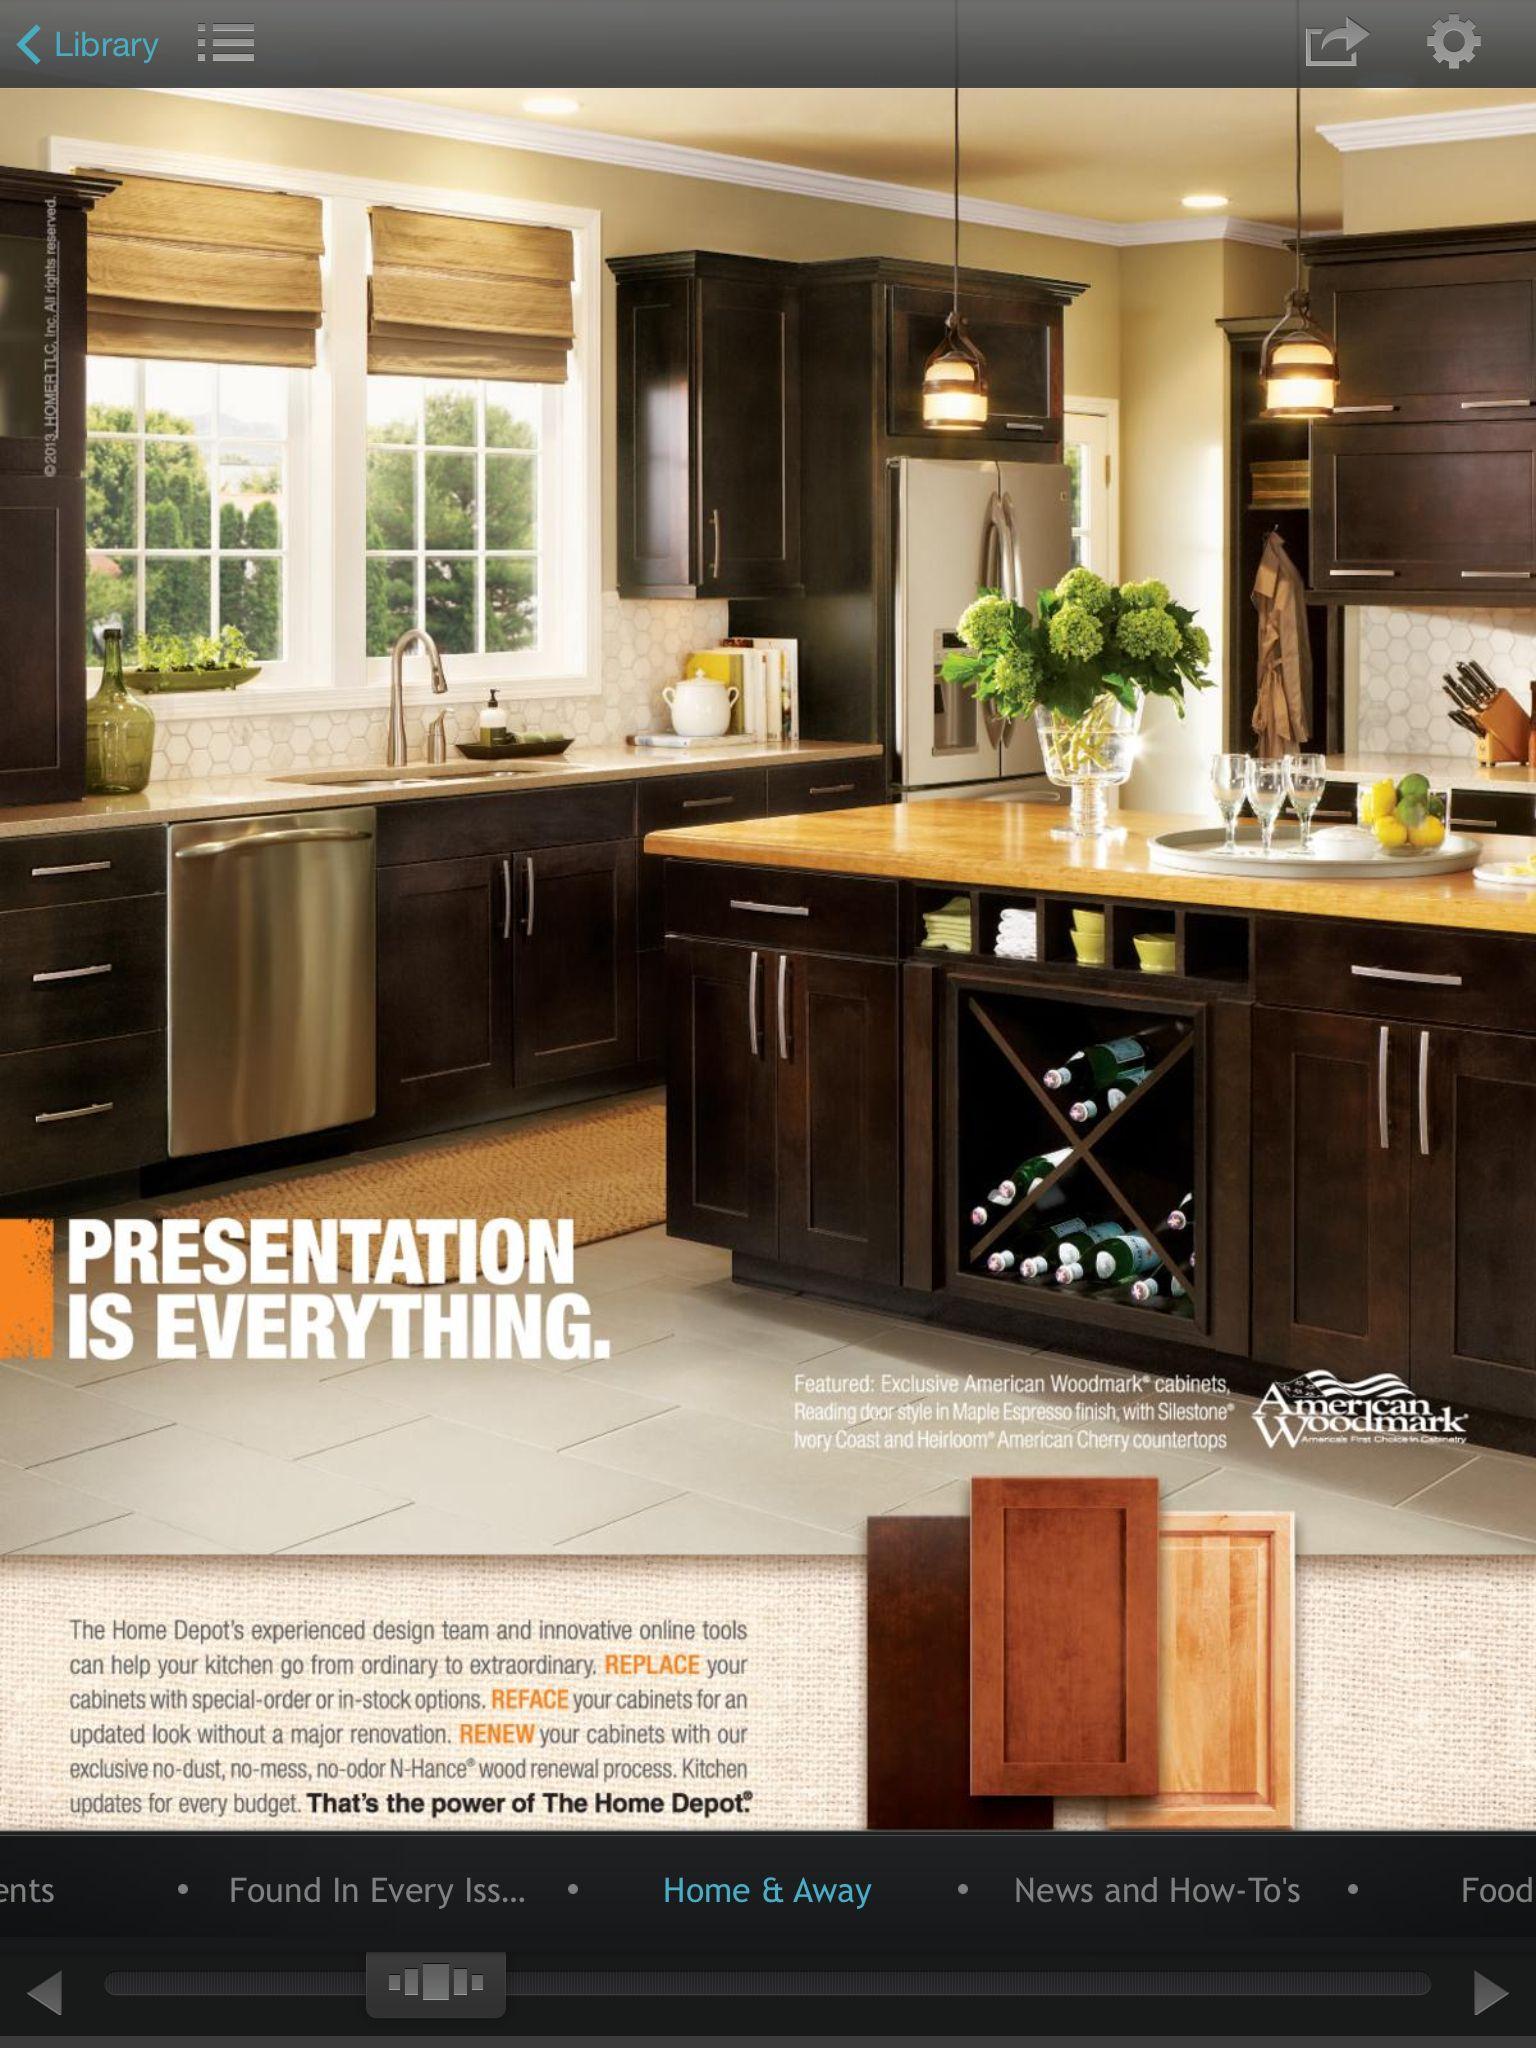 Love this kitchen! | Kitchen, American woodmark cabinets, Home